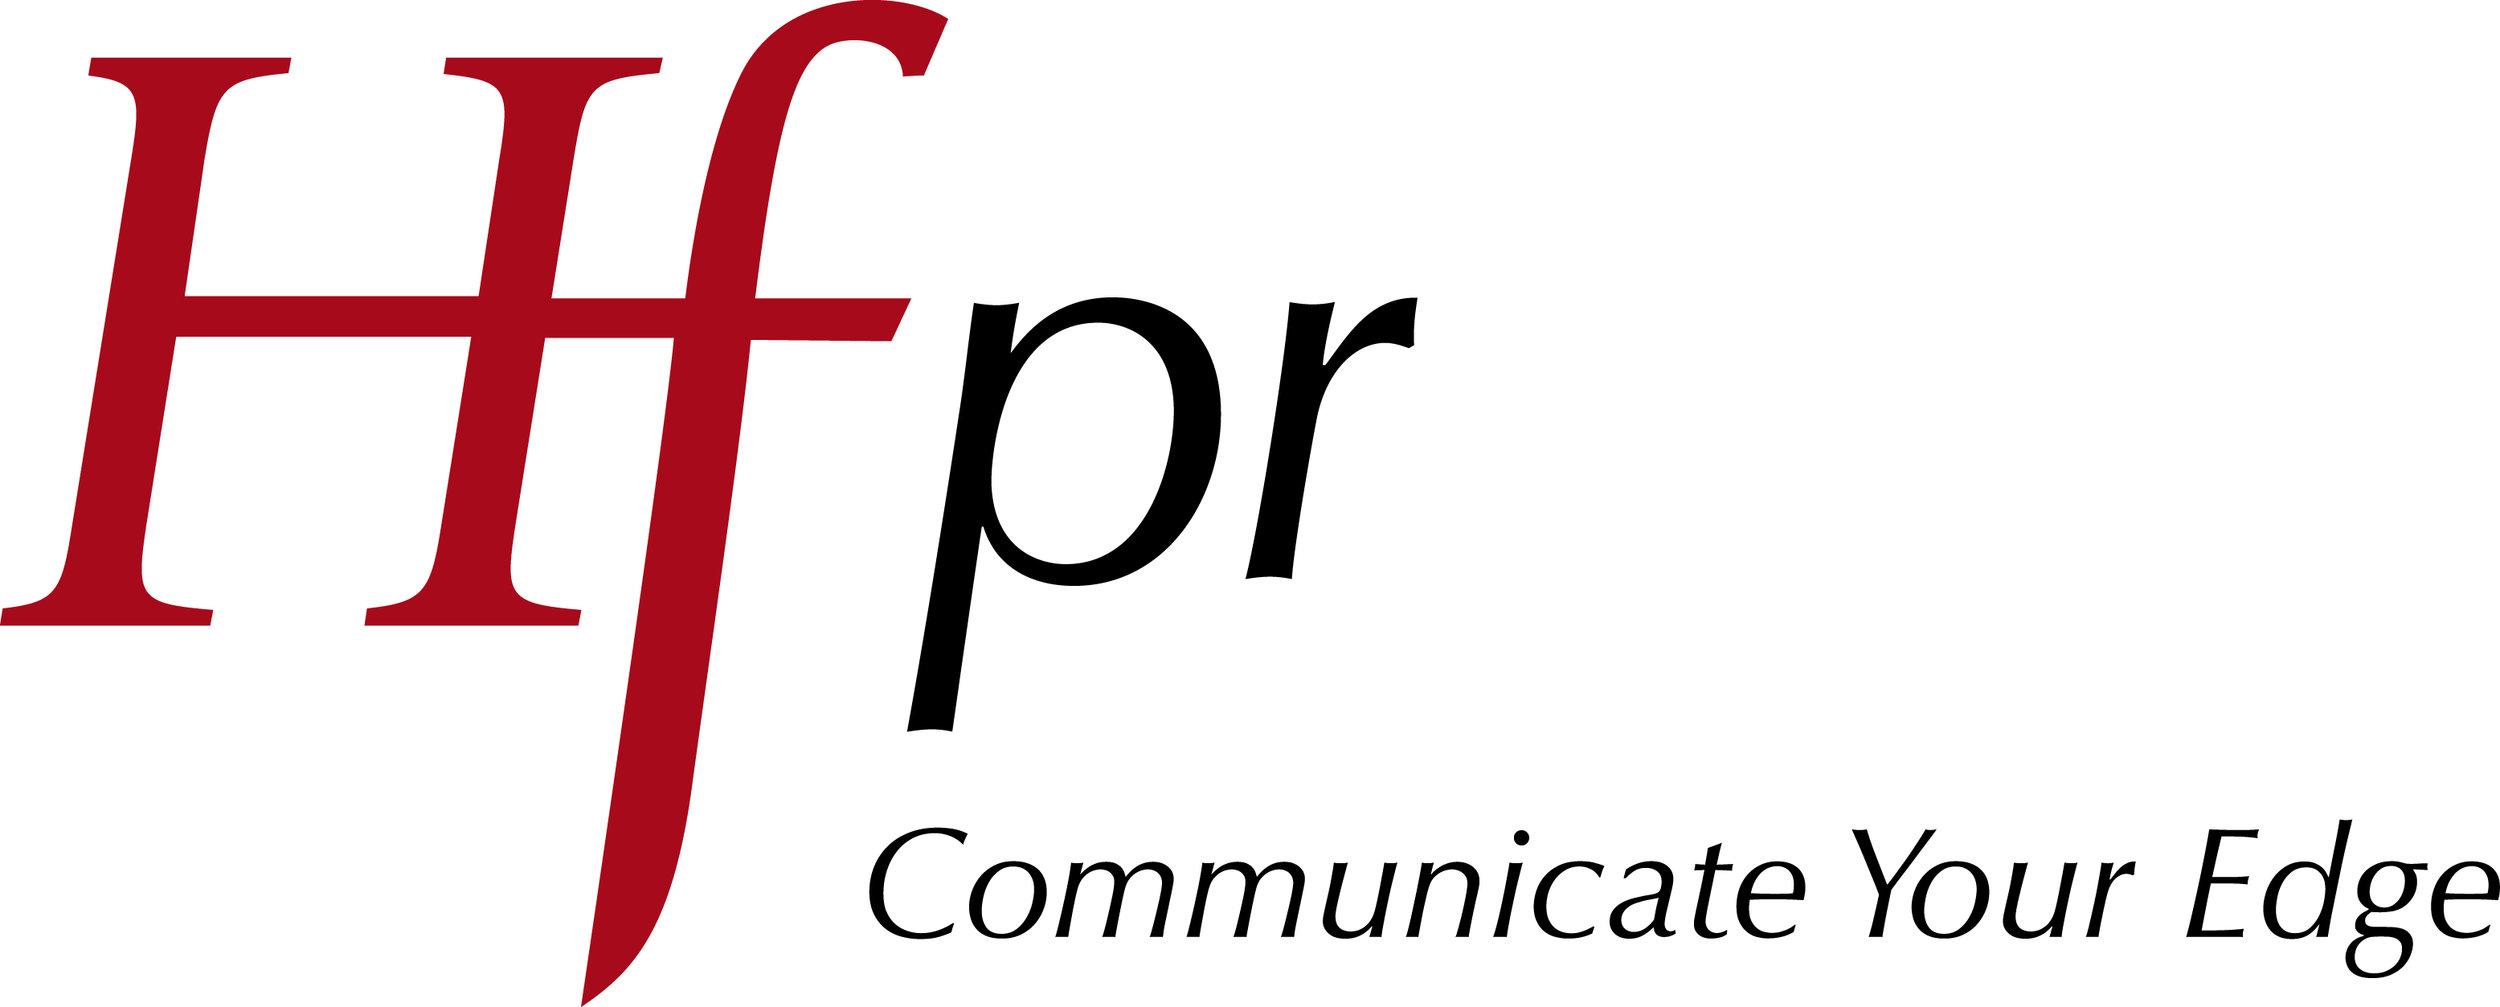 hf_pr_logo.jpg